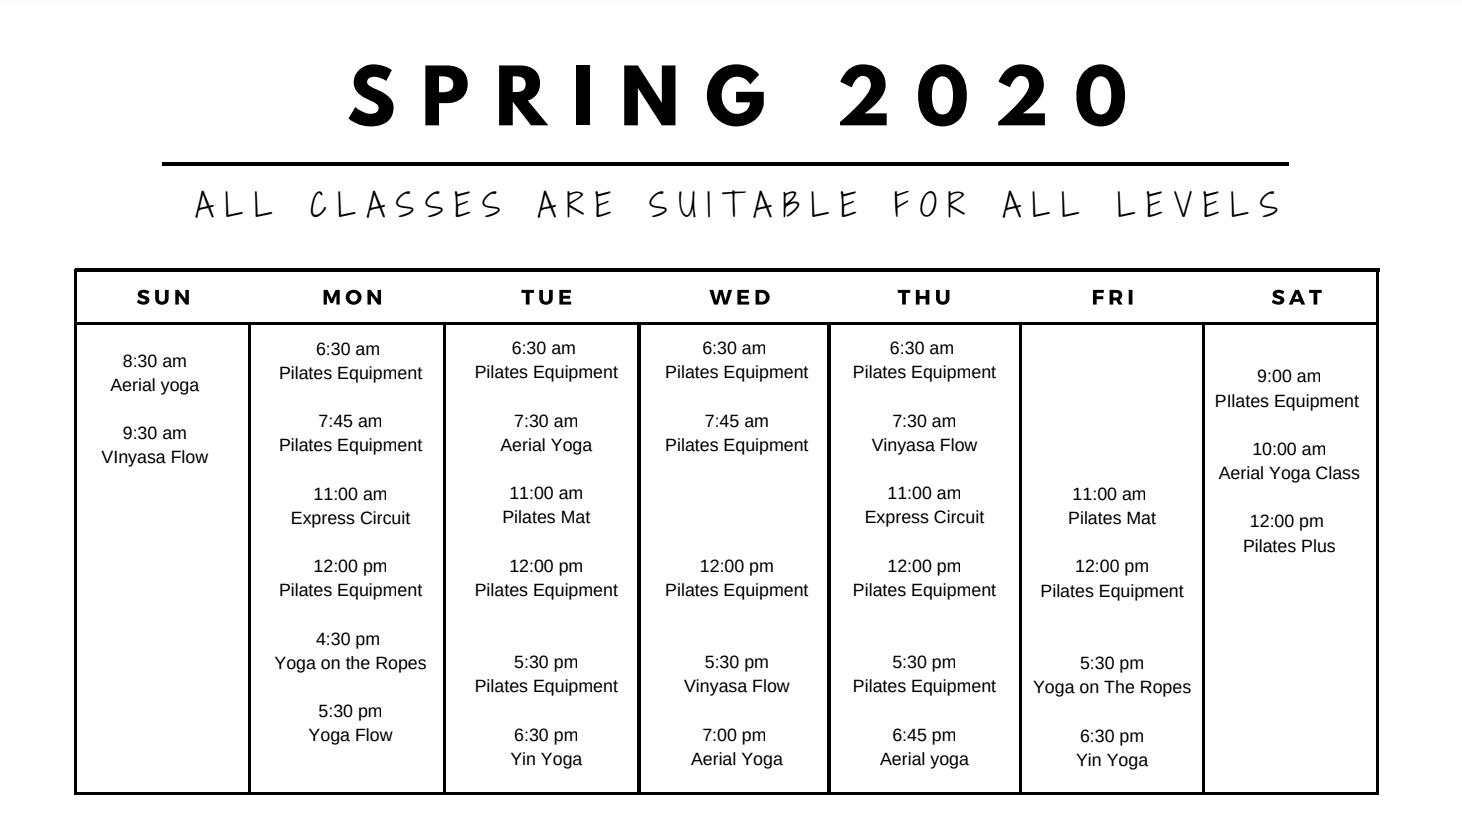 Verve Spring 2020 Class Schedule